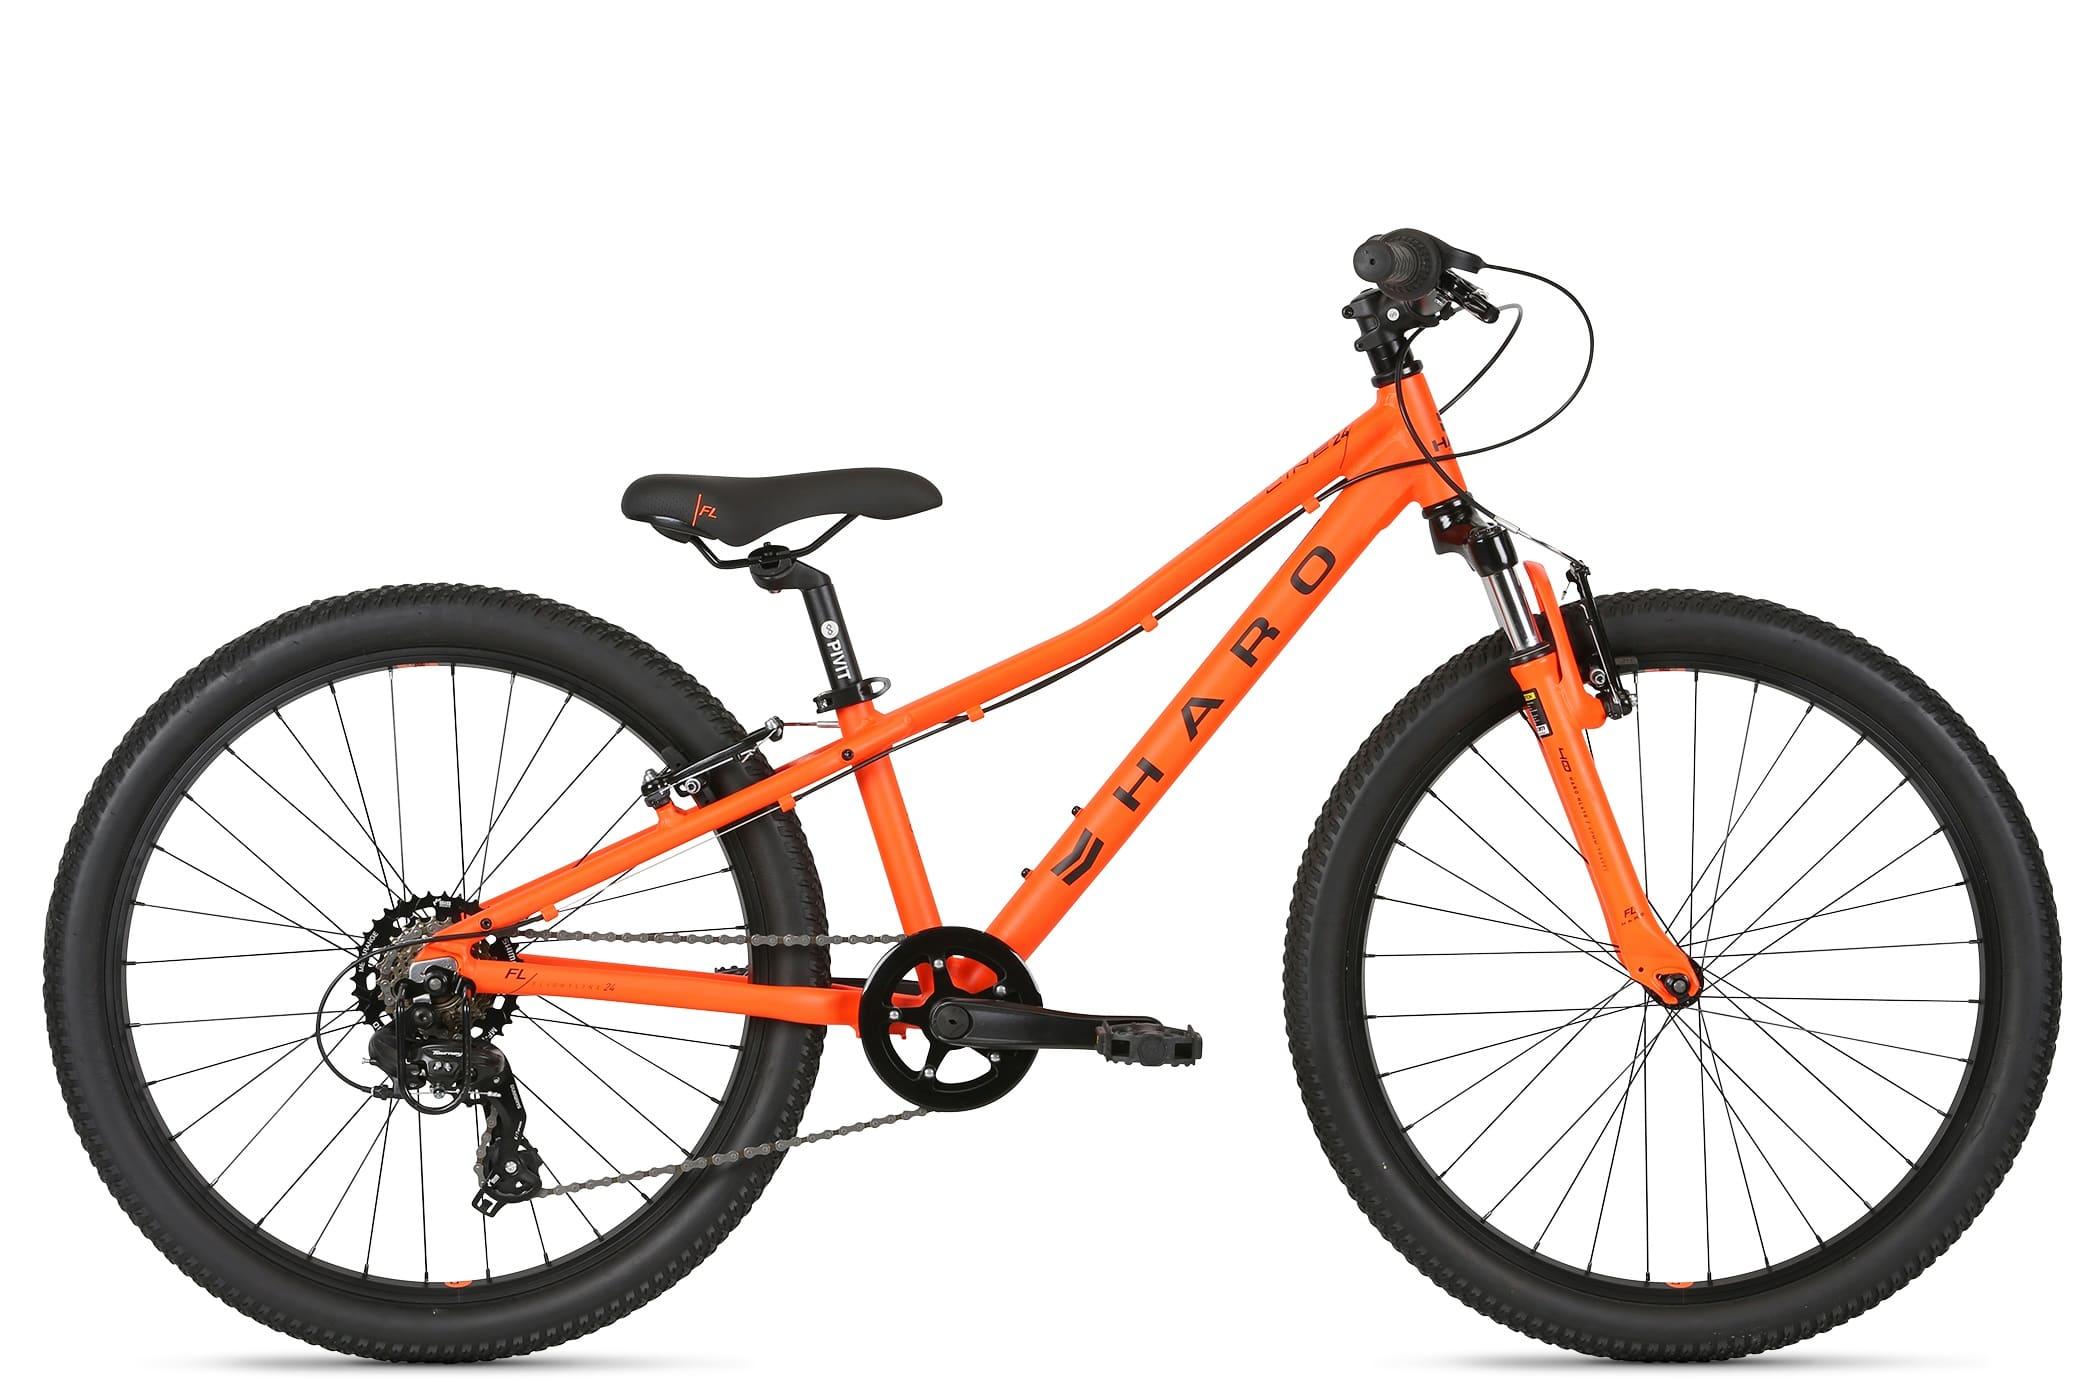 Haro Flightline 24 Bike - Orange